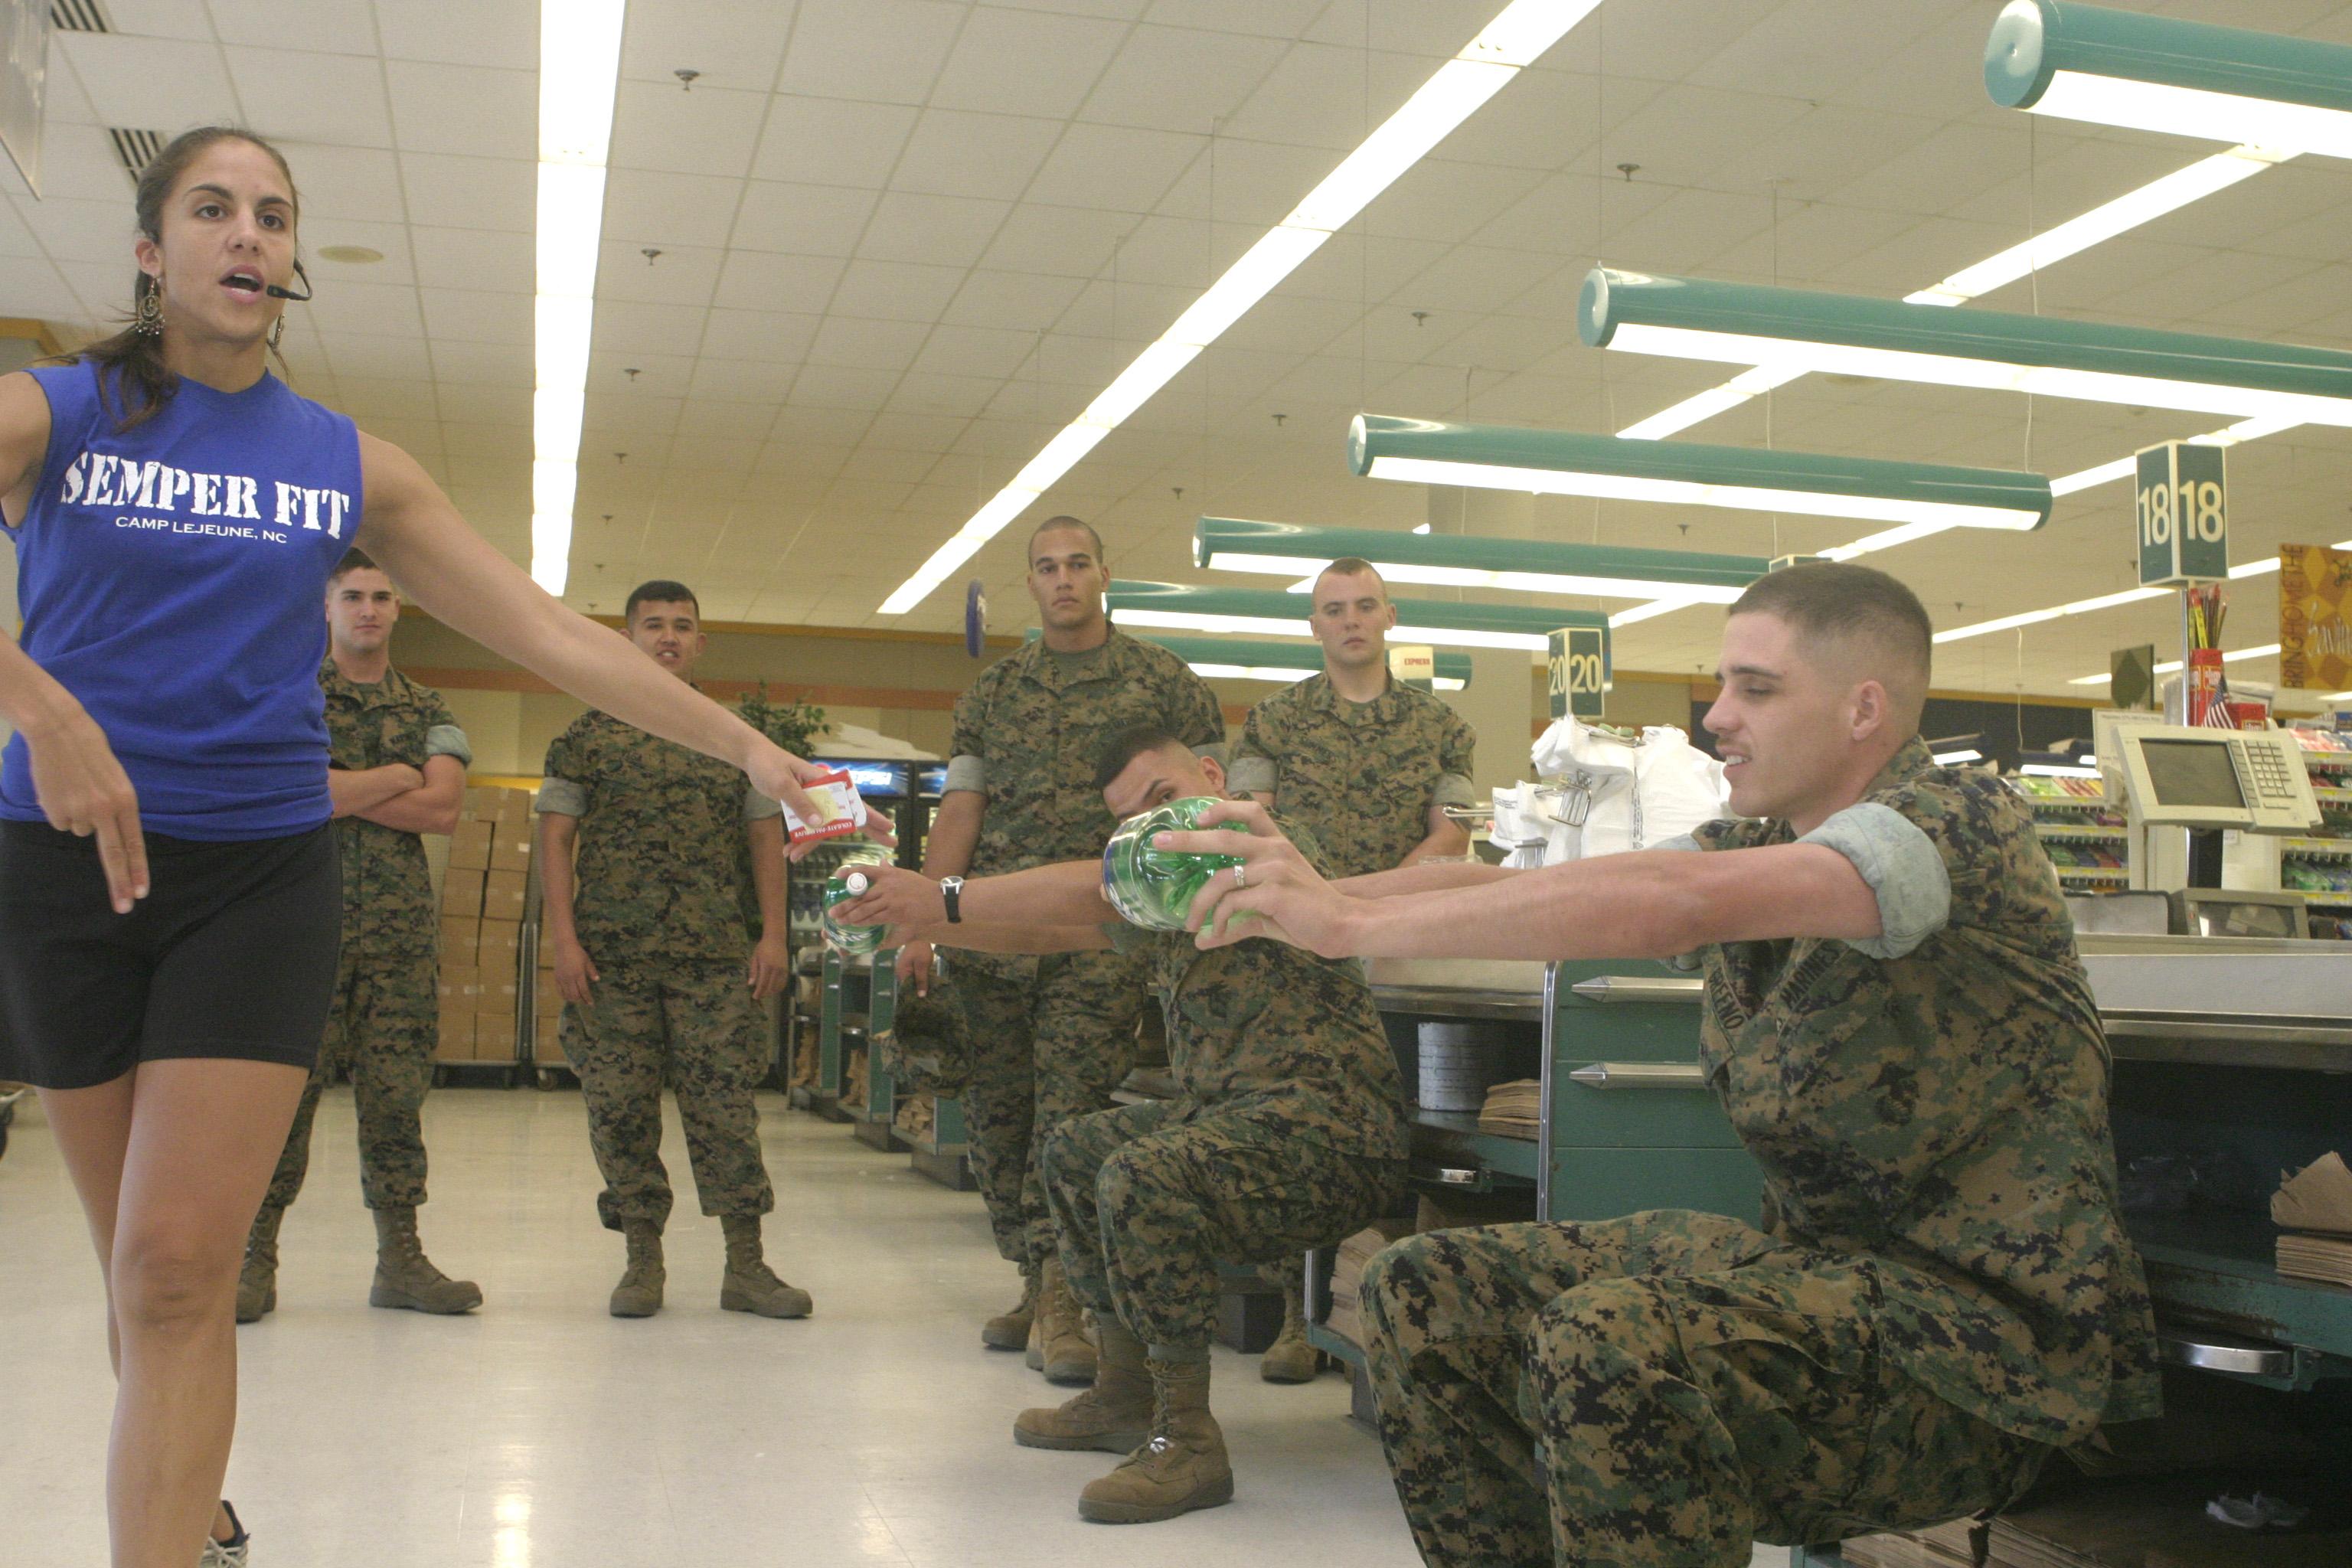 Marine dating service